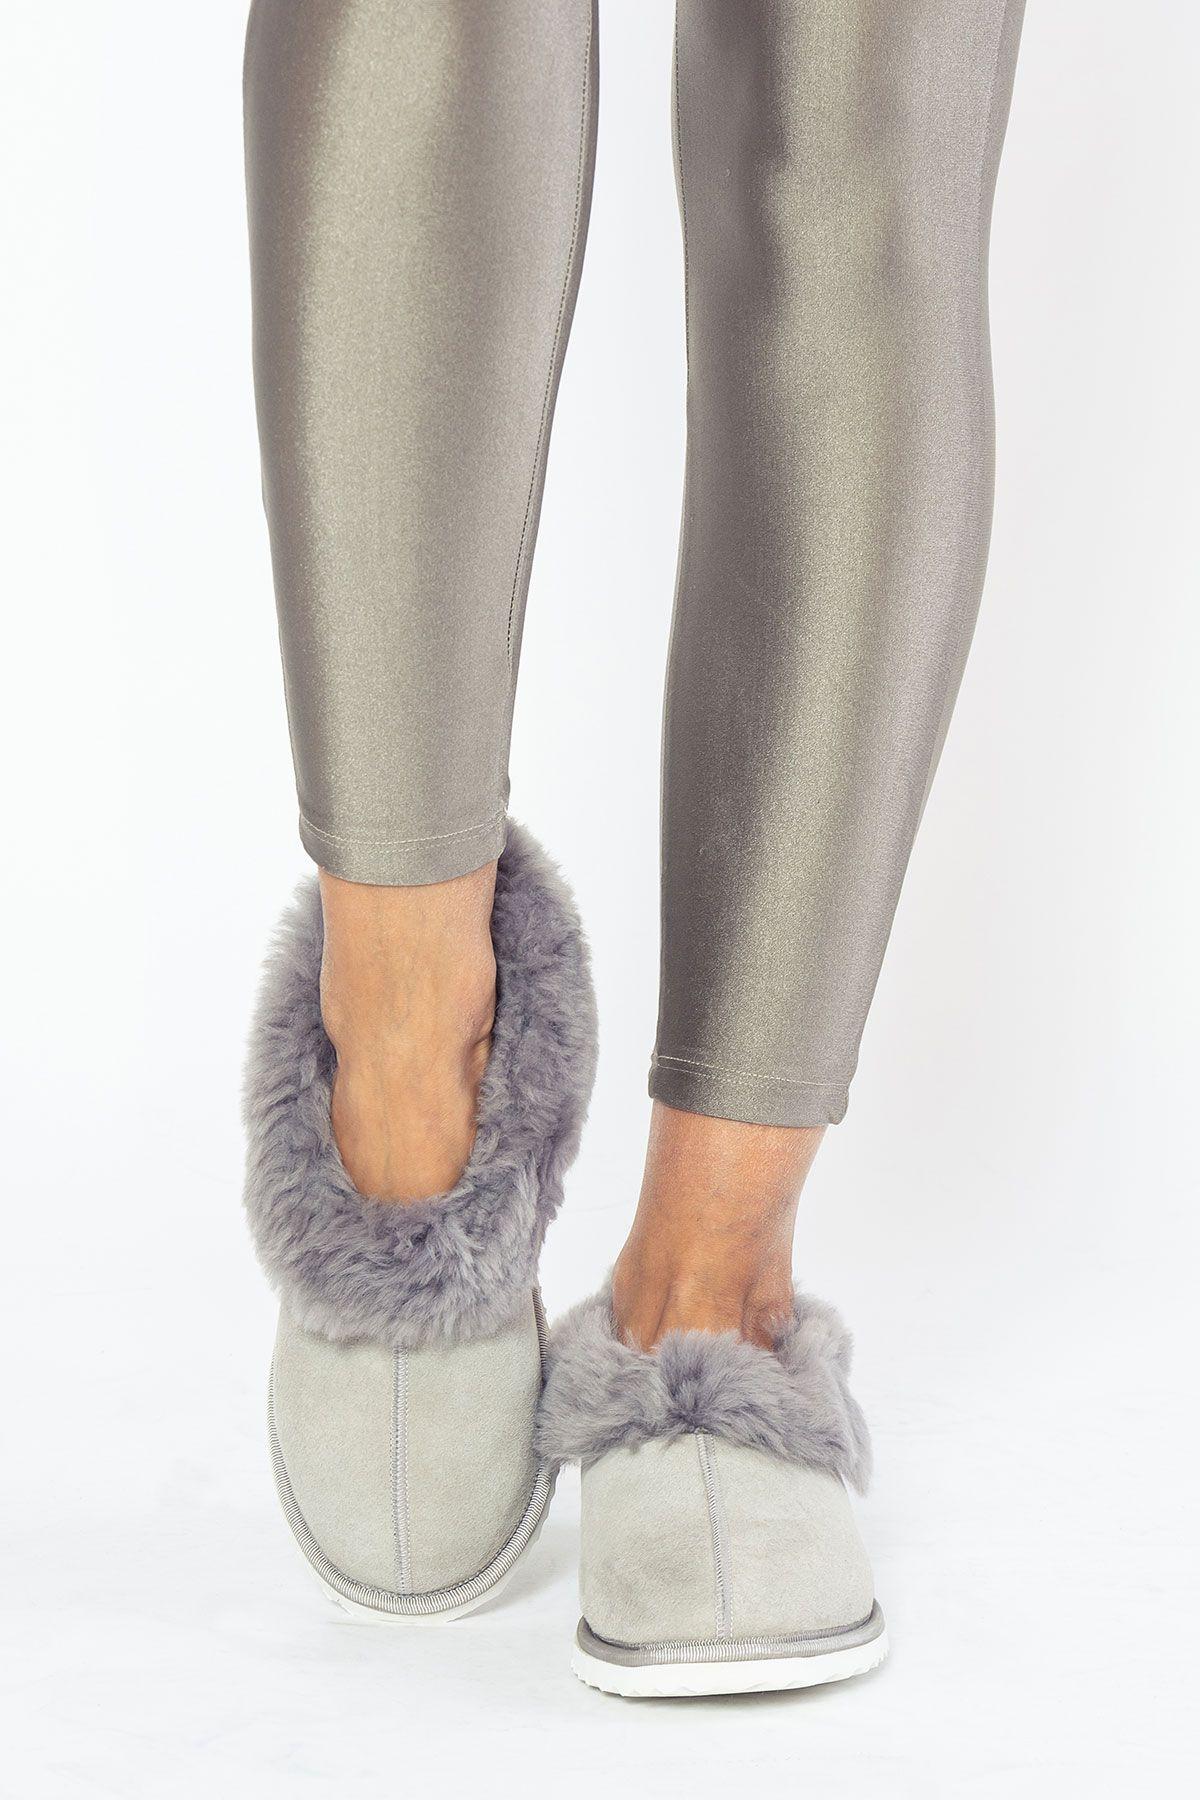 Pegia Genuine Suede Women's Sheepskin Lined House Shoes 191100 Gray